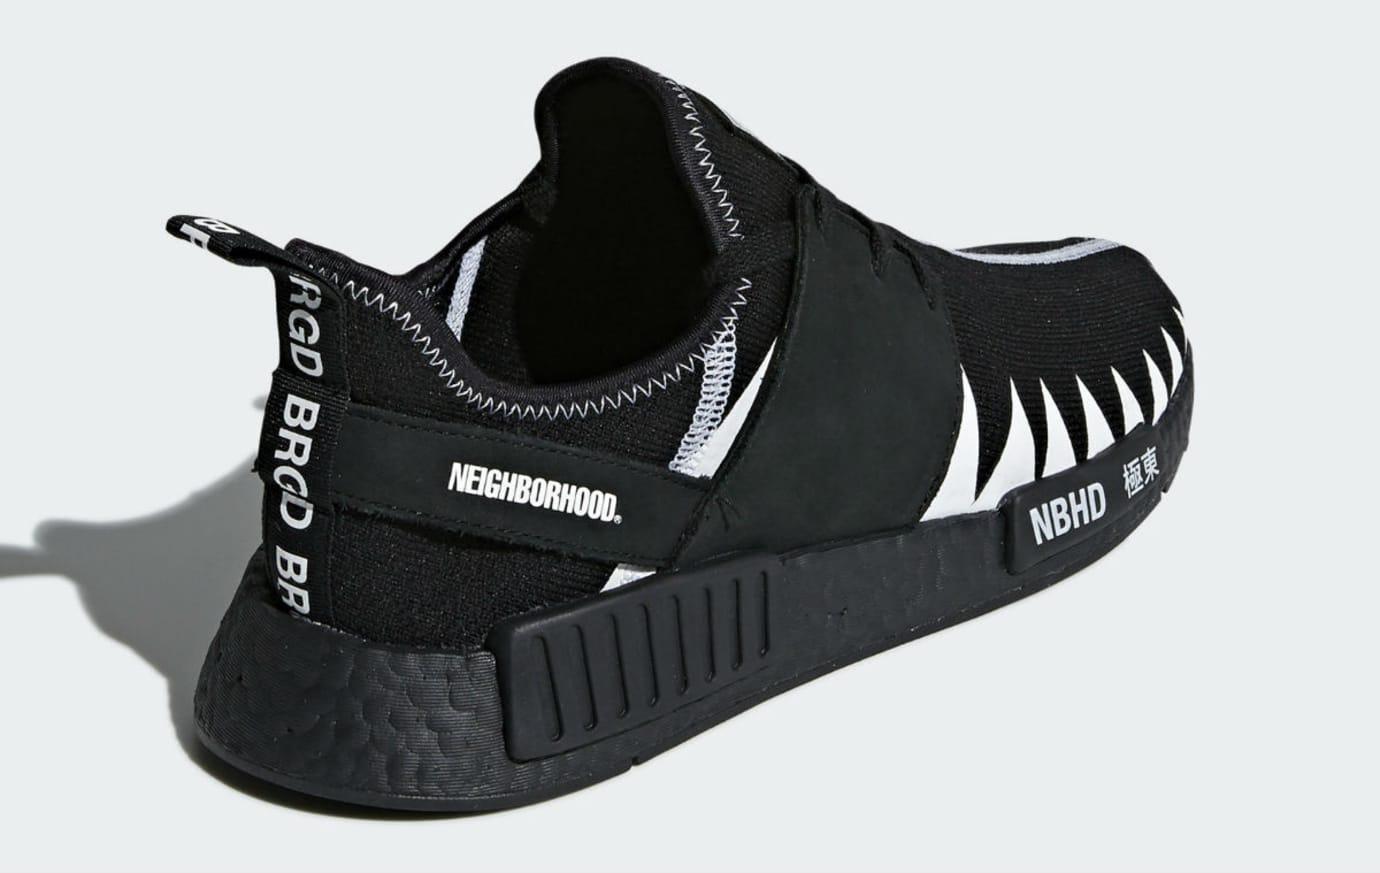 Neighborhood x Adidas NMD R1 Release Date DA8835 Heel